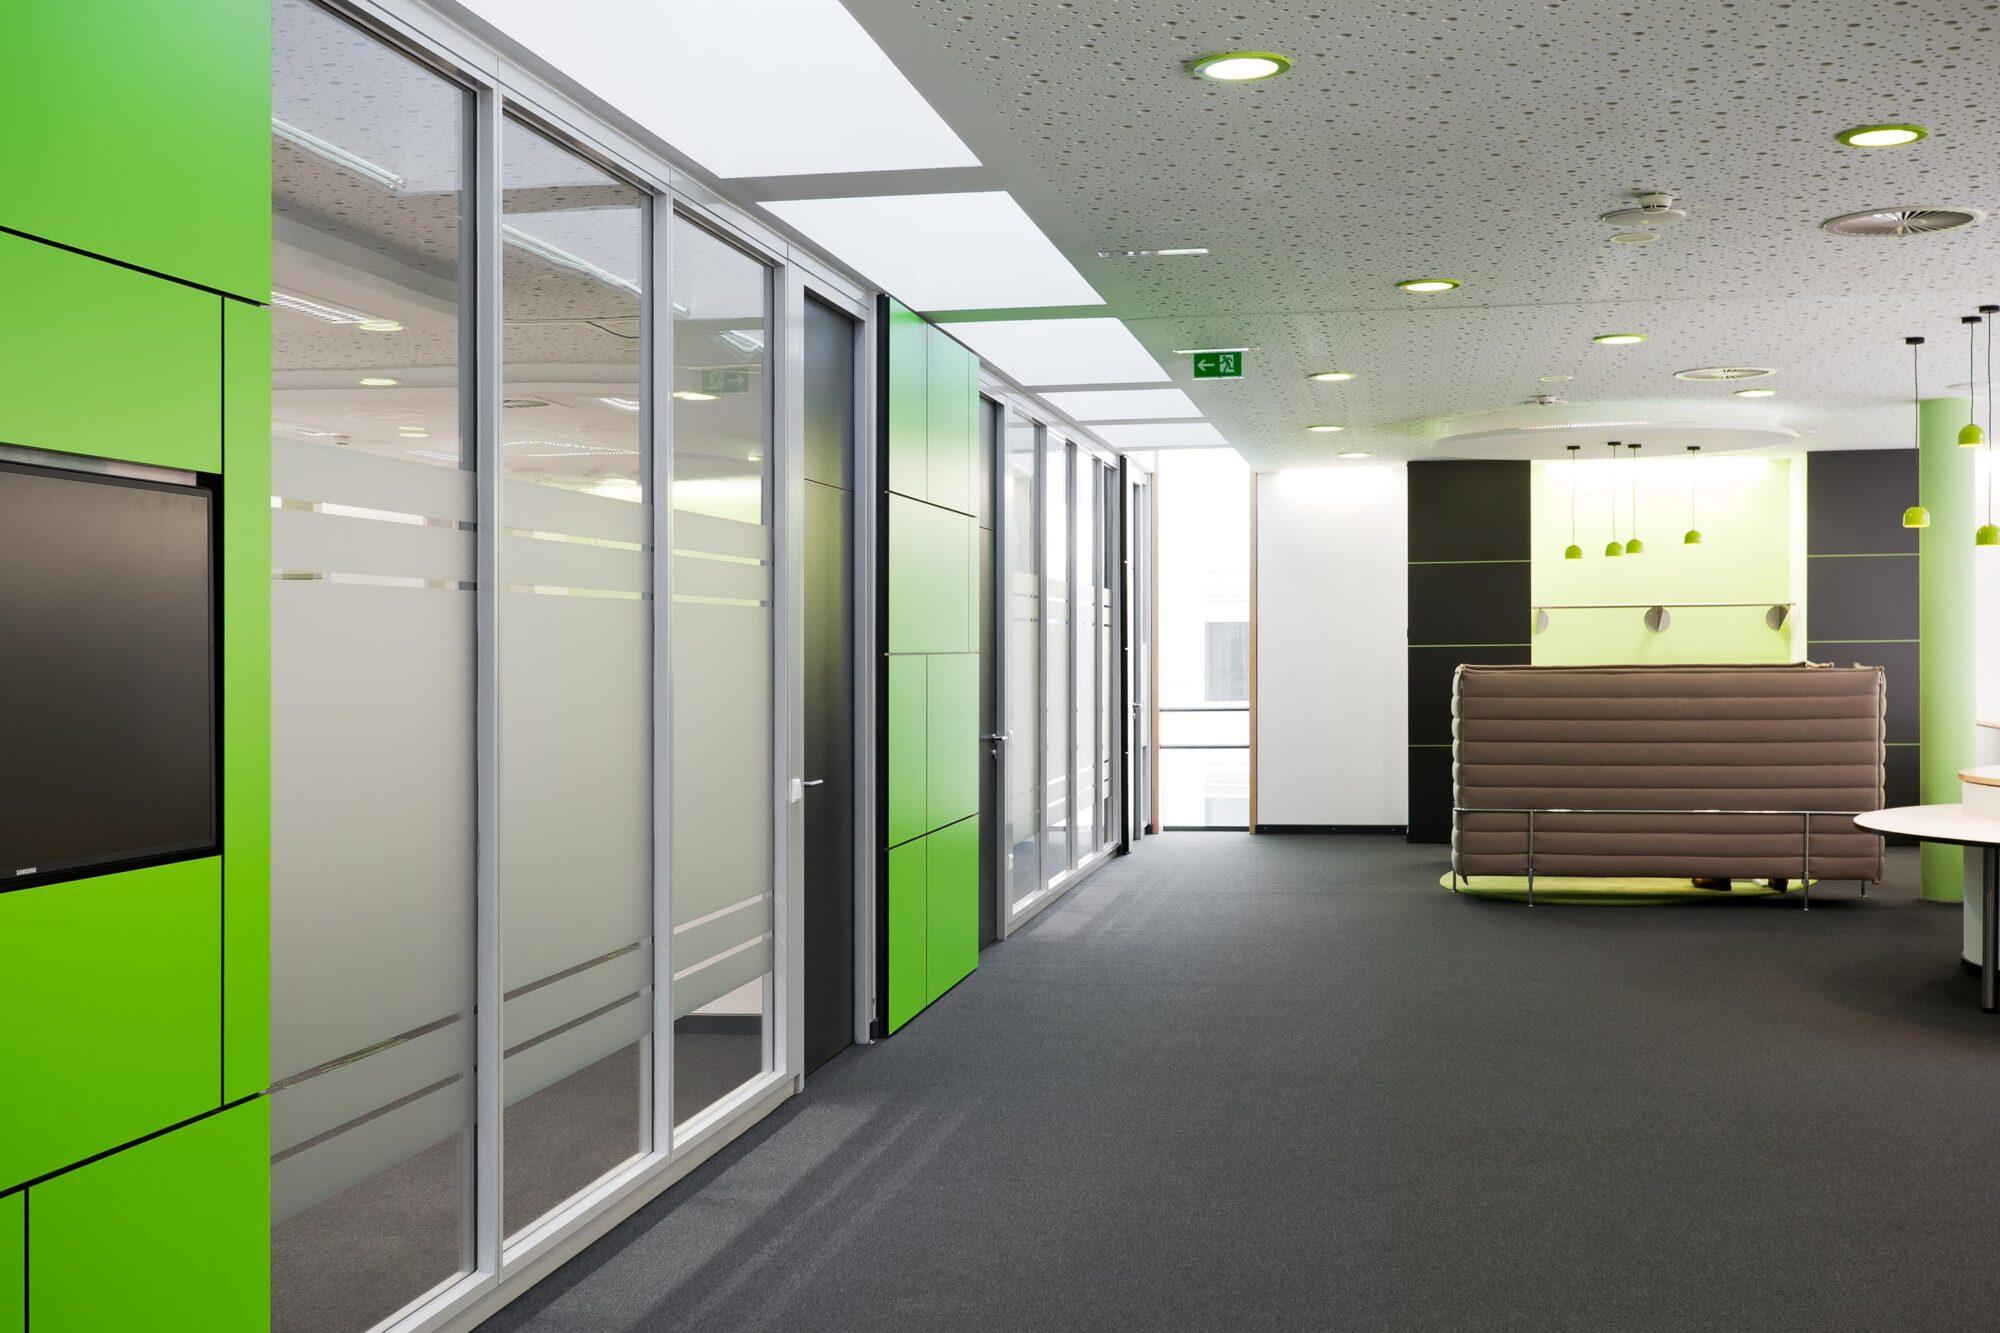 Karlsruhe│Trennwandsysteme│VBL, Karlsruhe